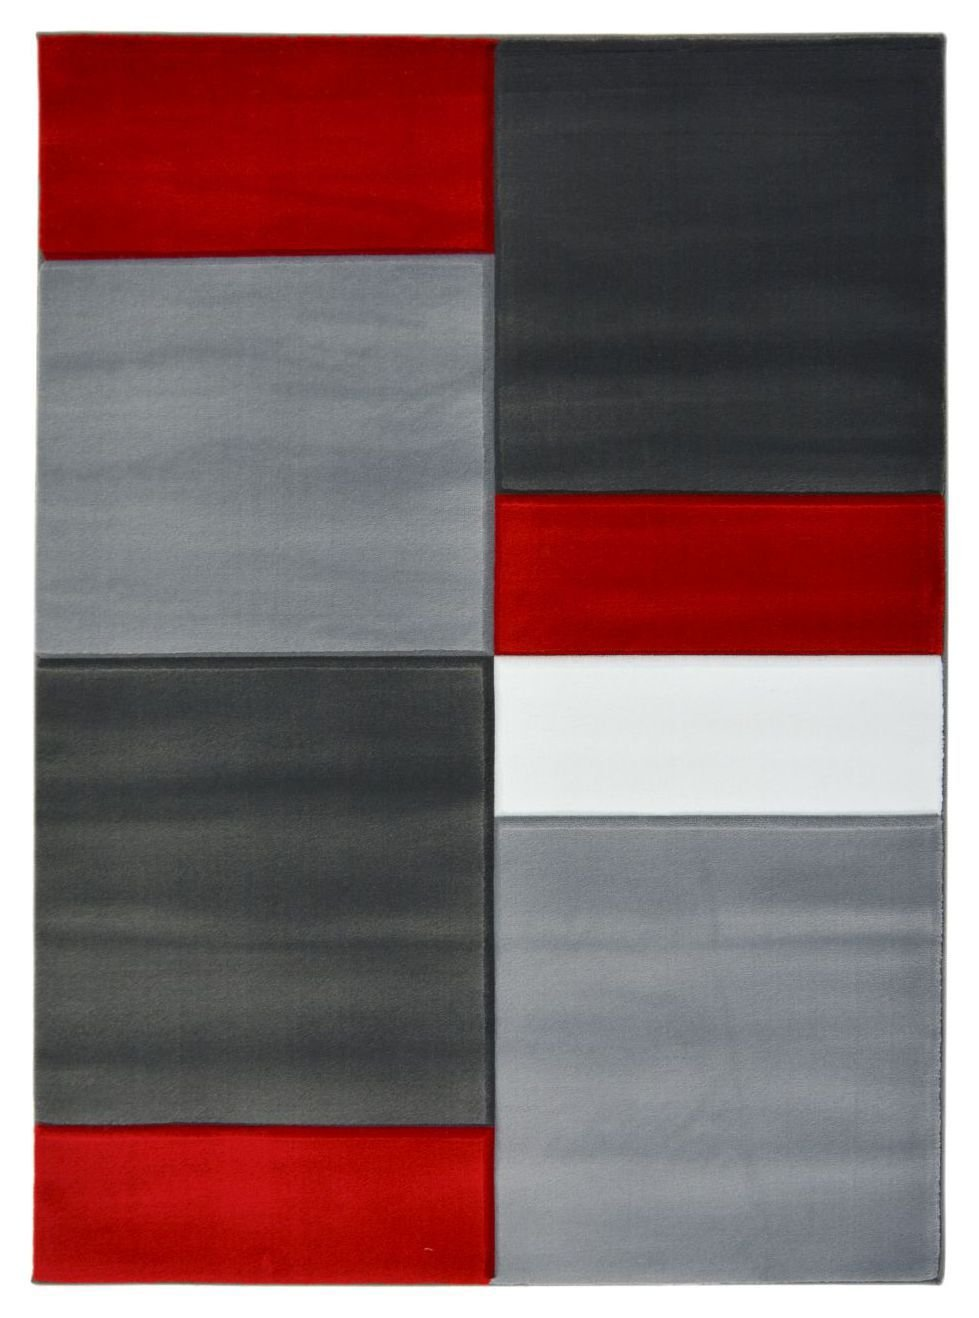 Melrose Daytona Blocks Rug - 120x170cm - Red